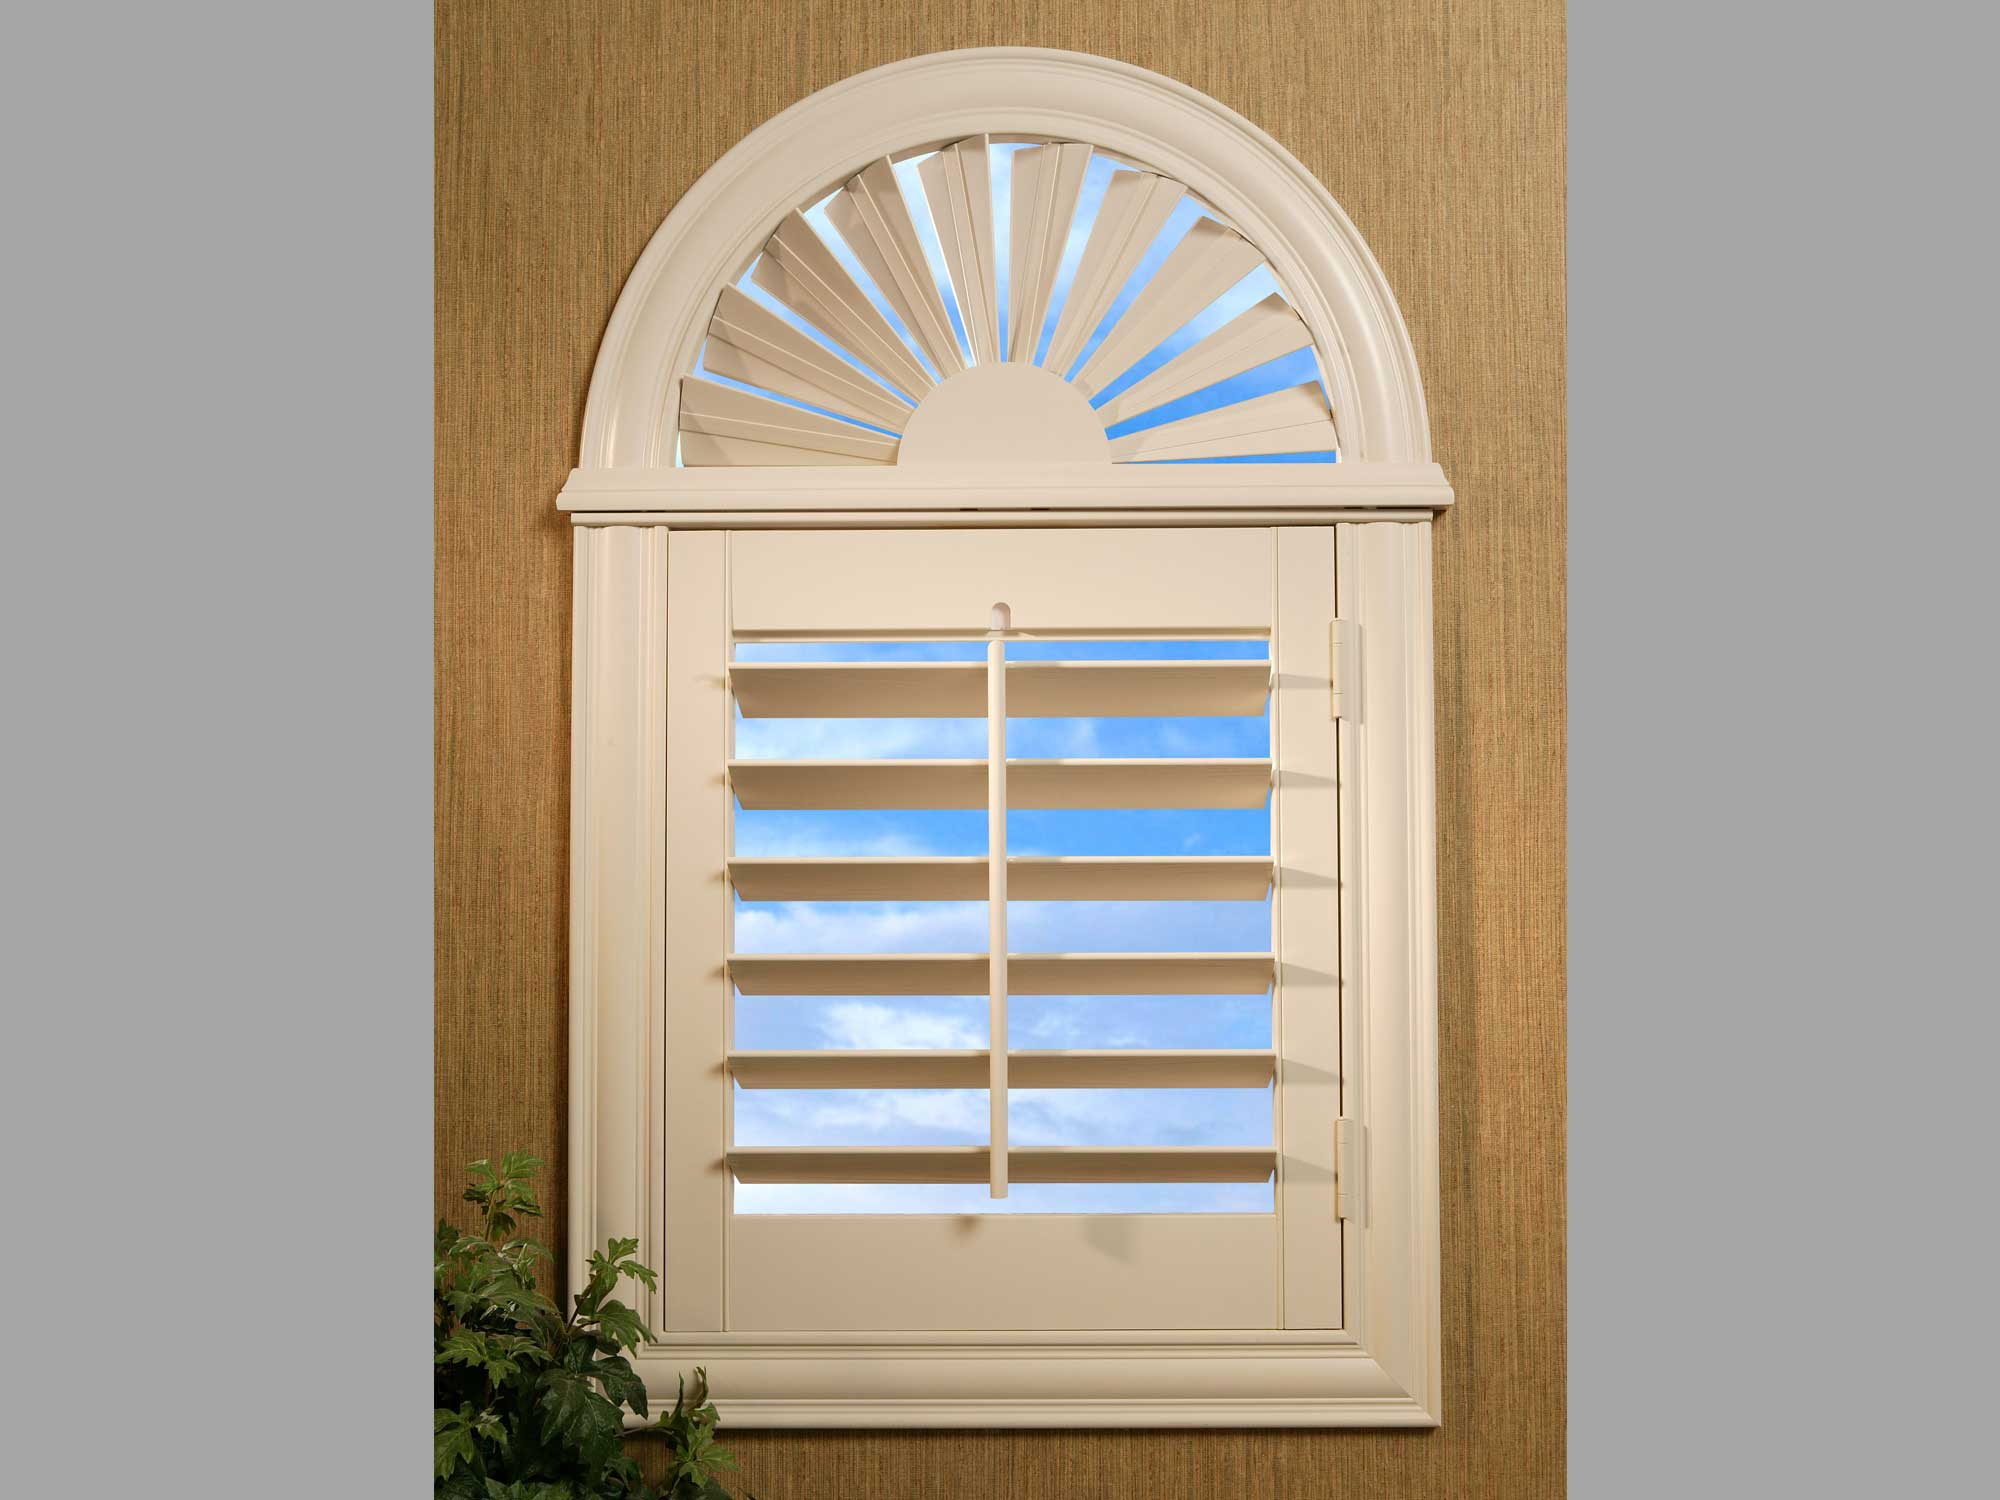 sunburst shutters window covering ideas u0026 inspiration: sunburst arch top shutters image GAZCRQE